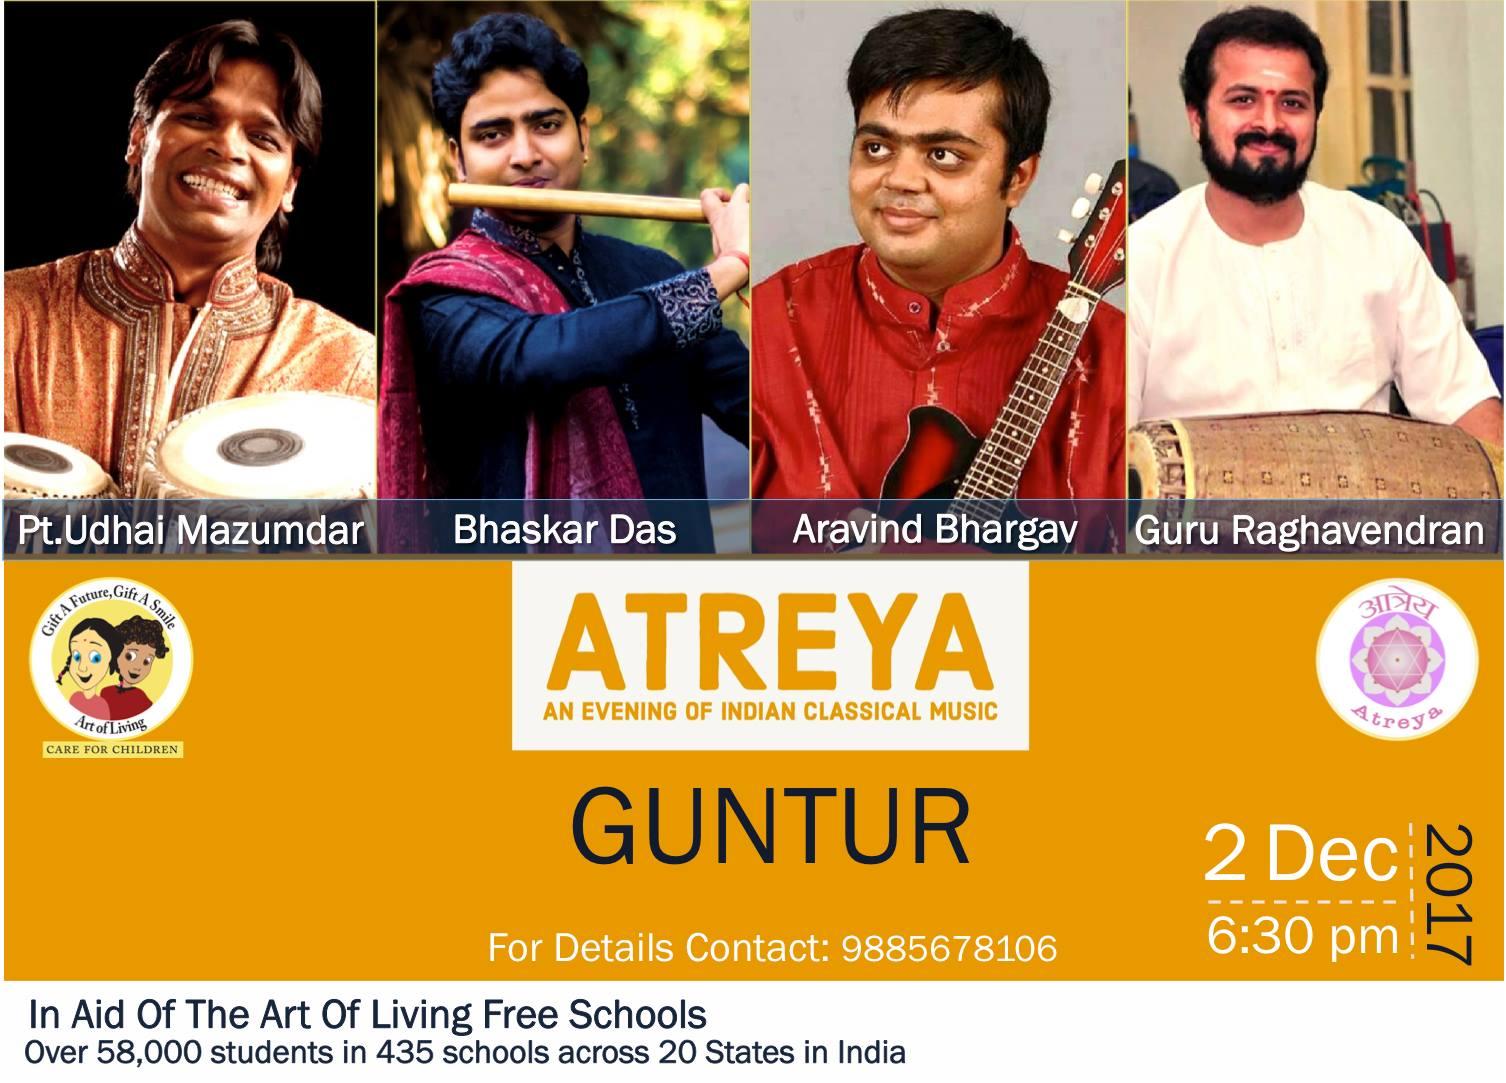 2017 atreya indian classical music concert guntur bansuri mandolin bhaskar das aravind bhargav